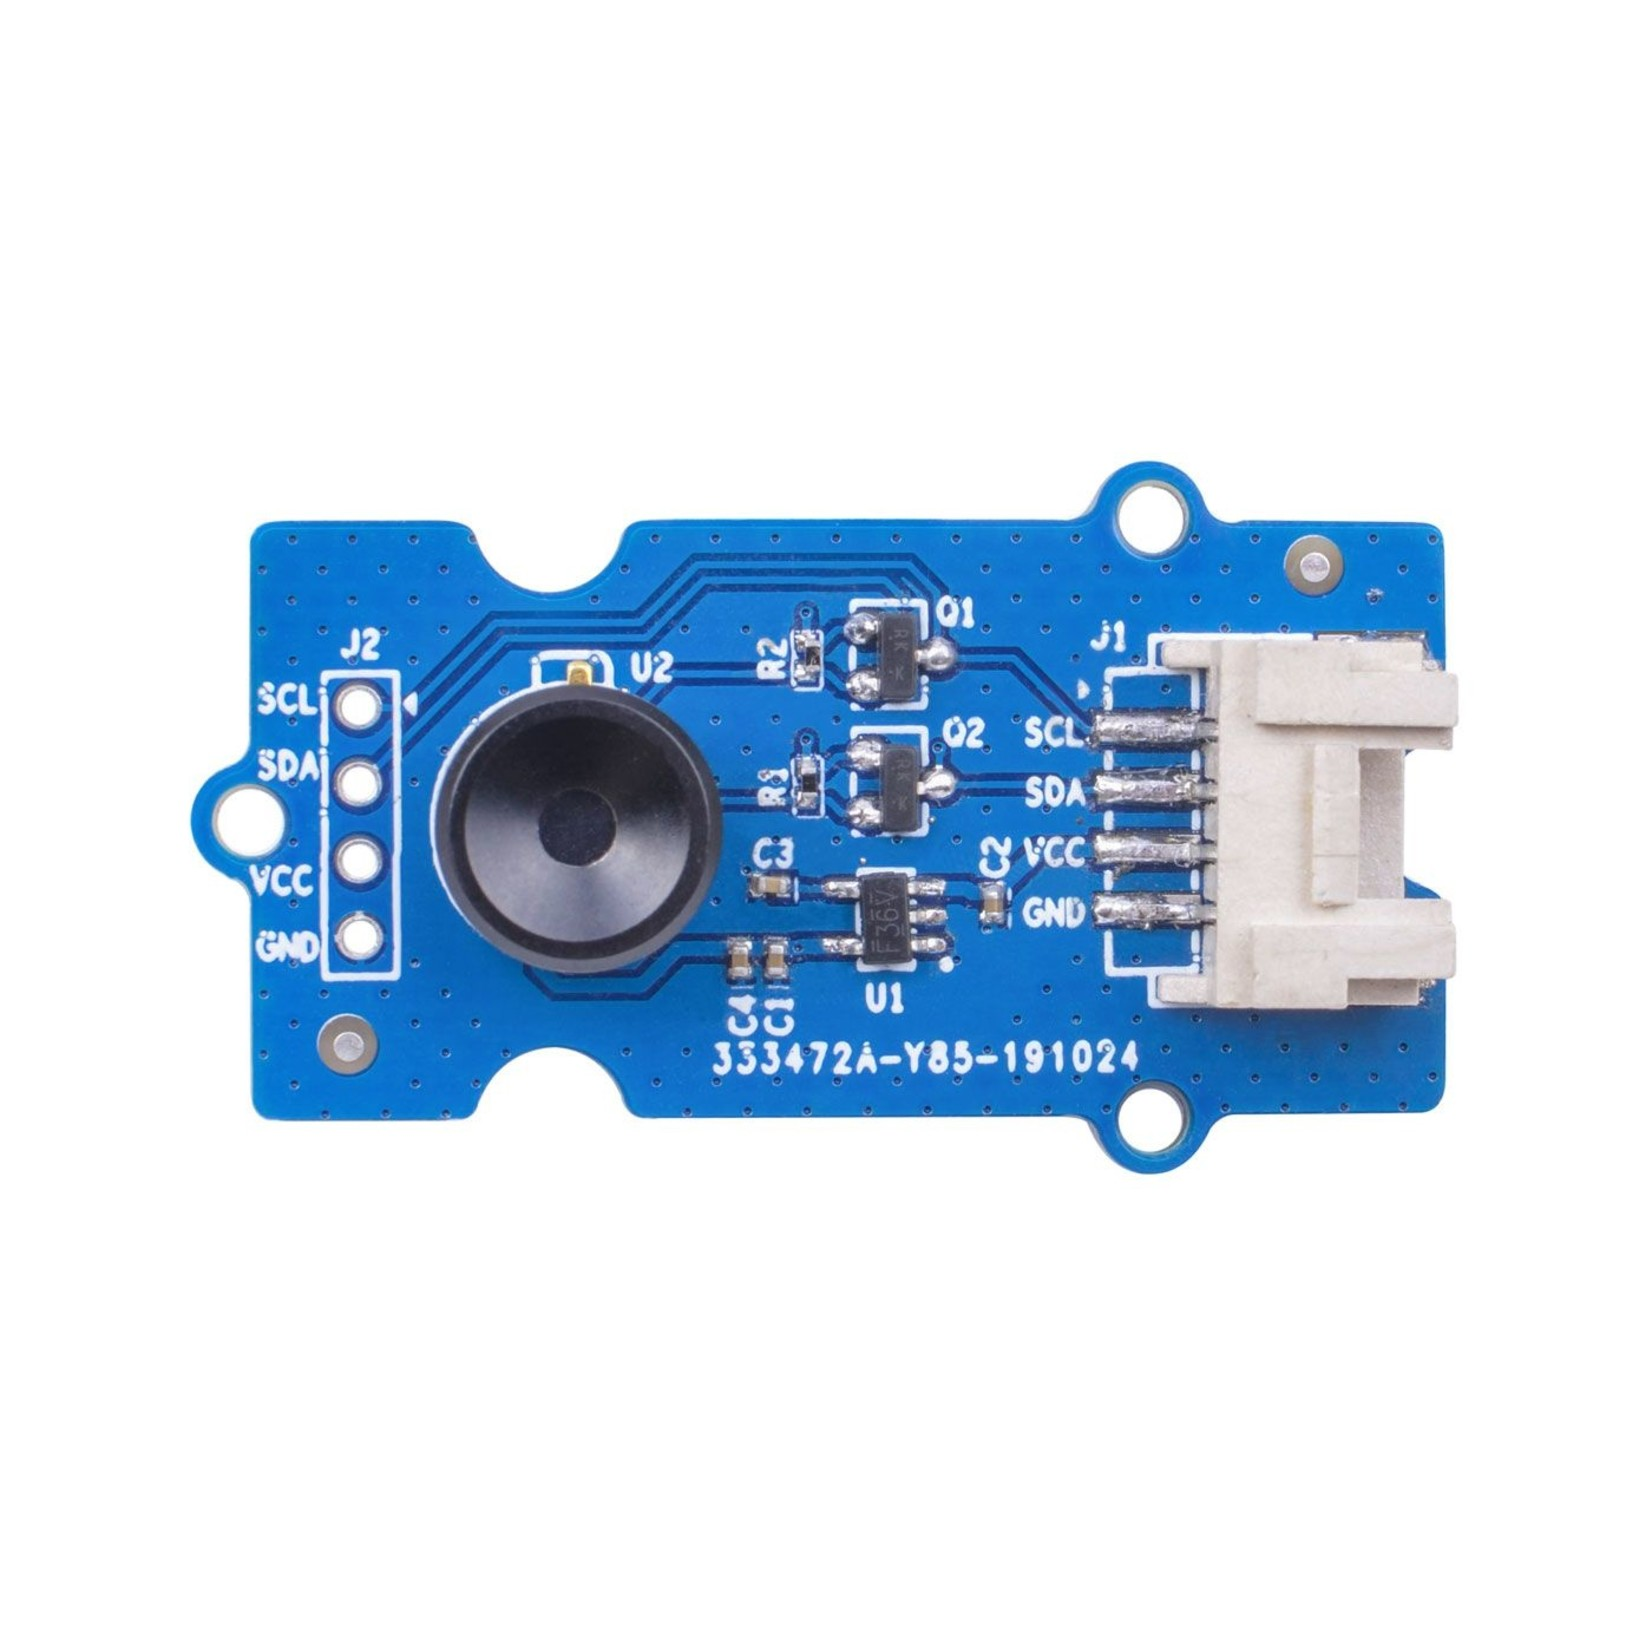 Seeed Grove - Thermal Imaging Camera / IR Array MLX90640 110°